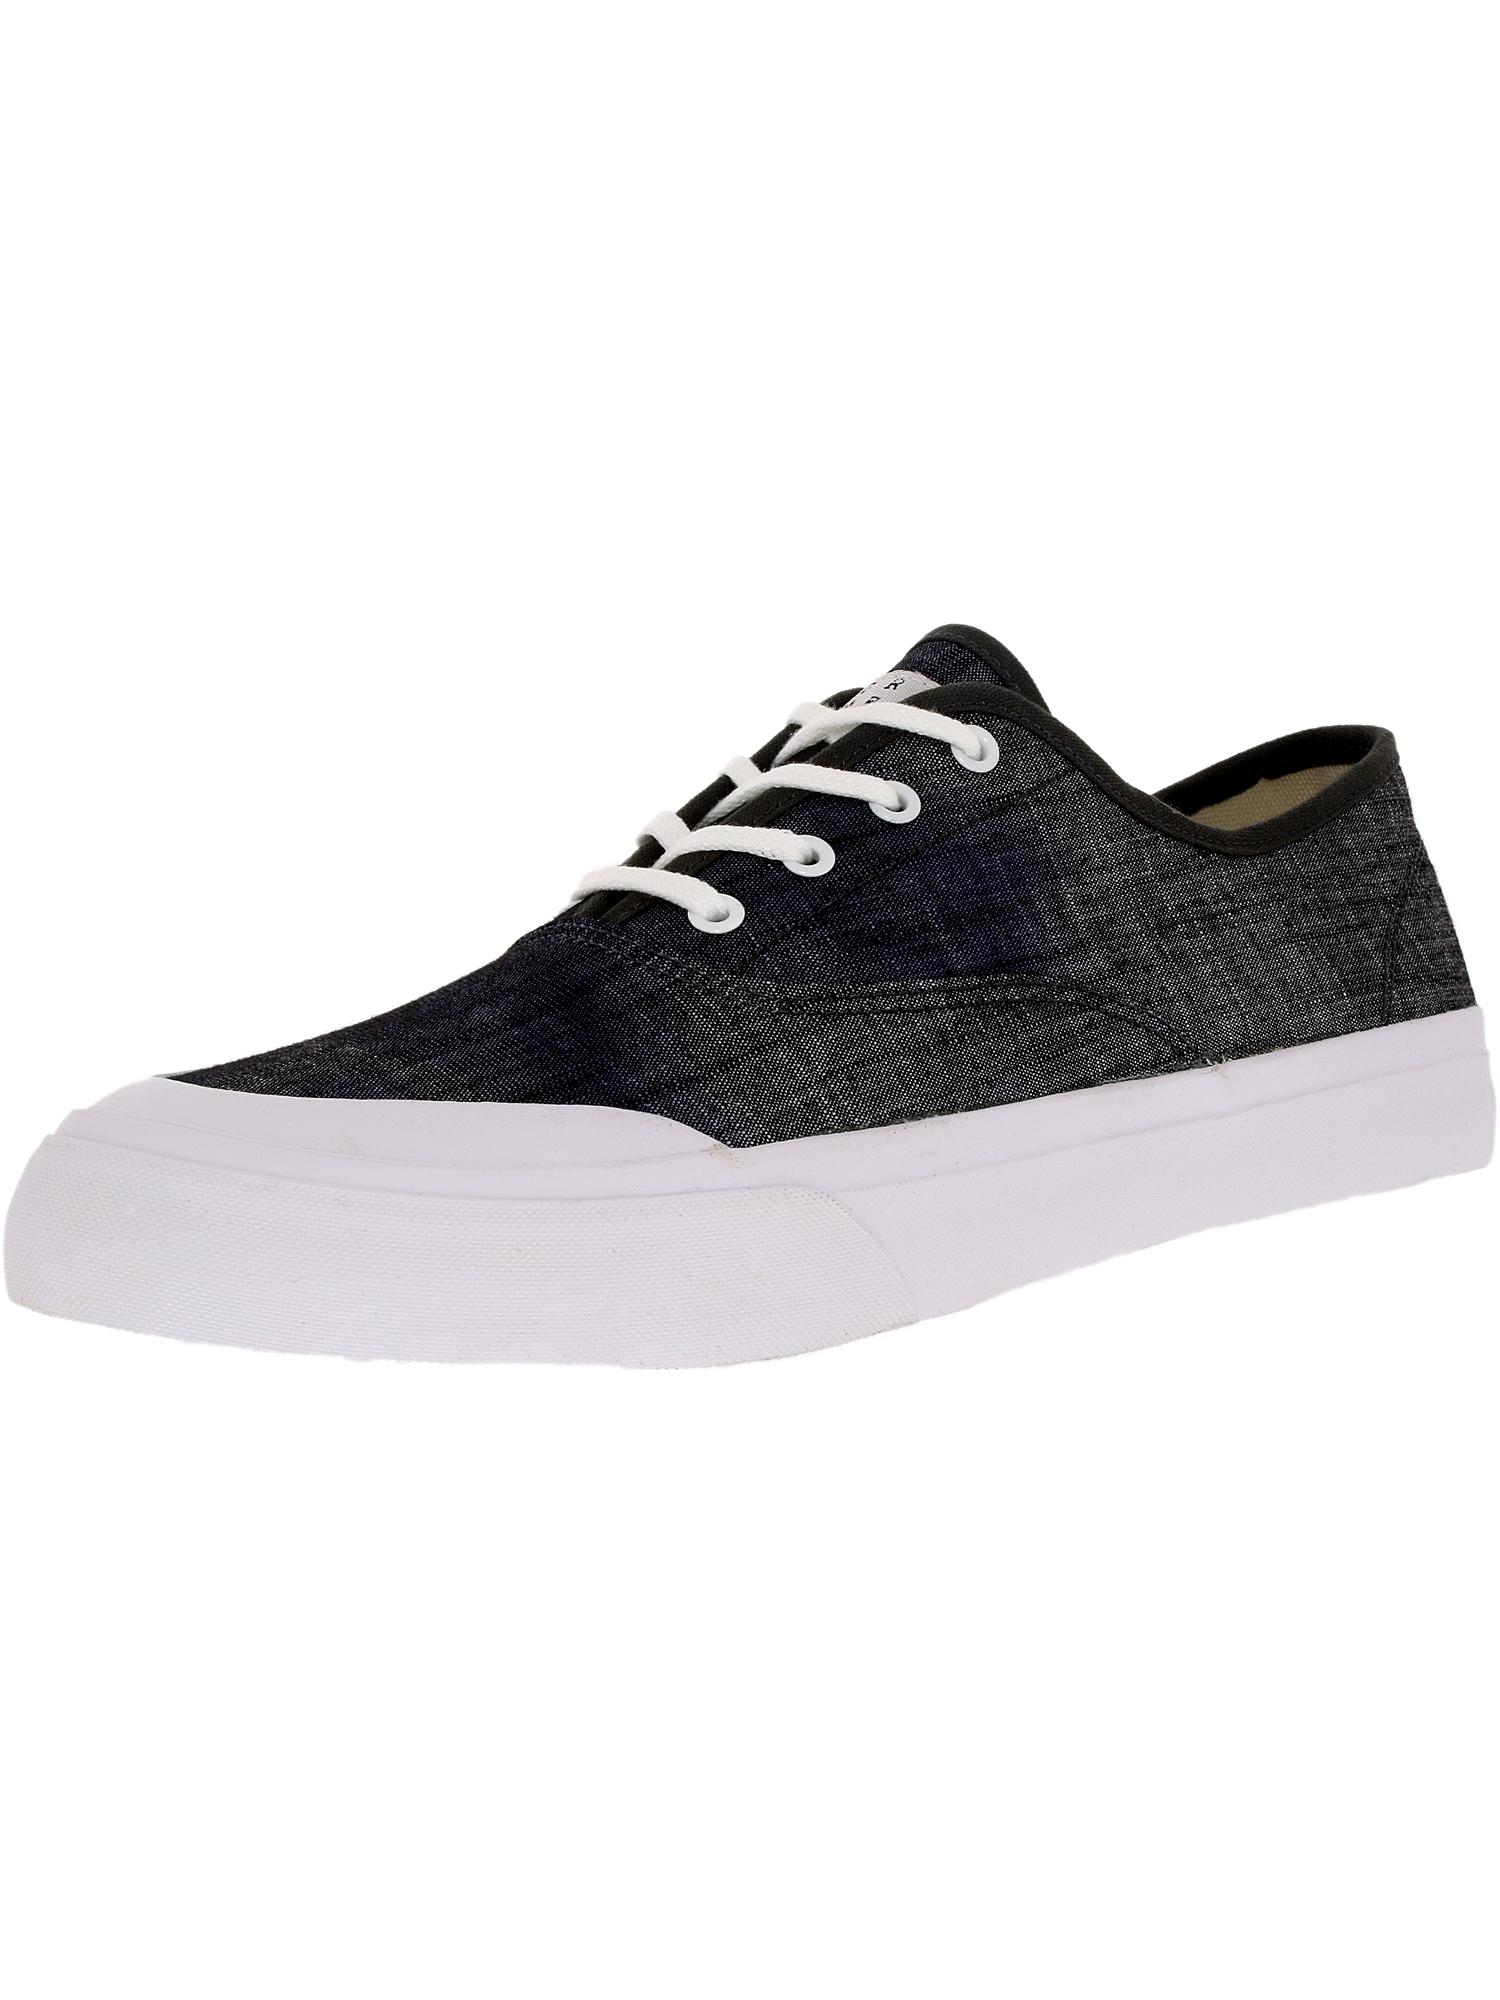 Huf Men's Cromer Dip Dye Navy Ankle-High Canvas Fashion Sneaker - 11M